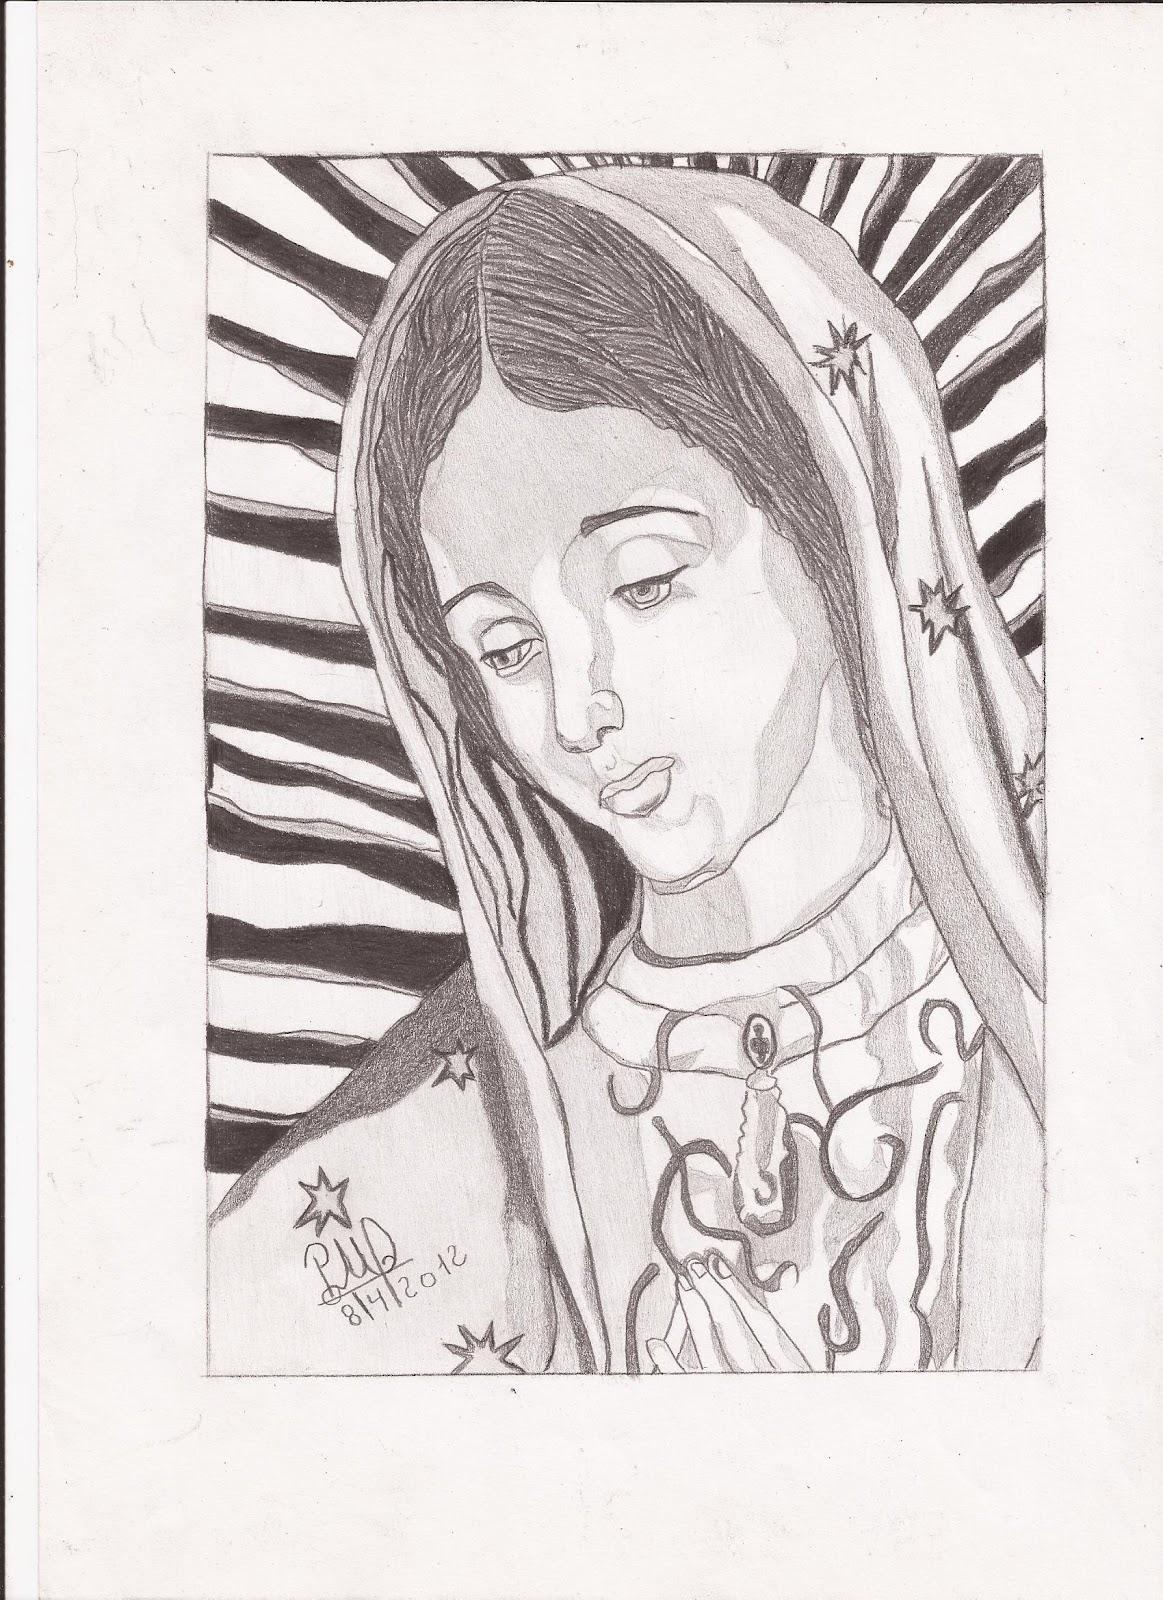 Dibujos de la Virgen de Guadalupe - Imagui